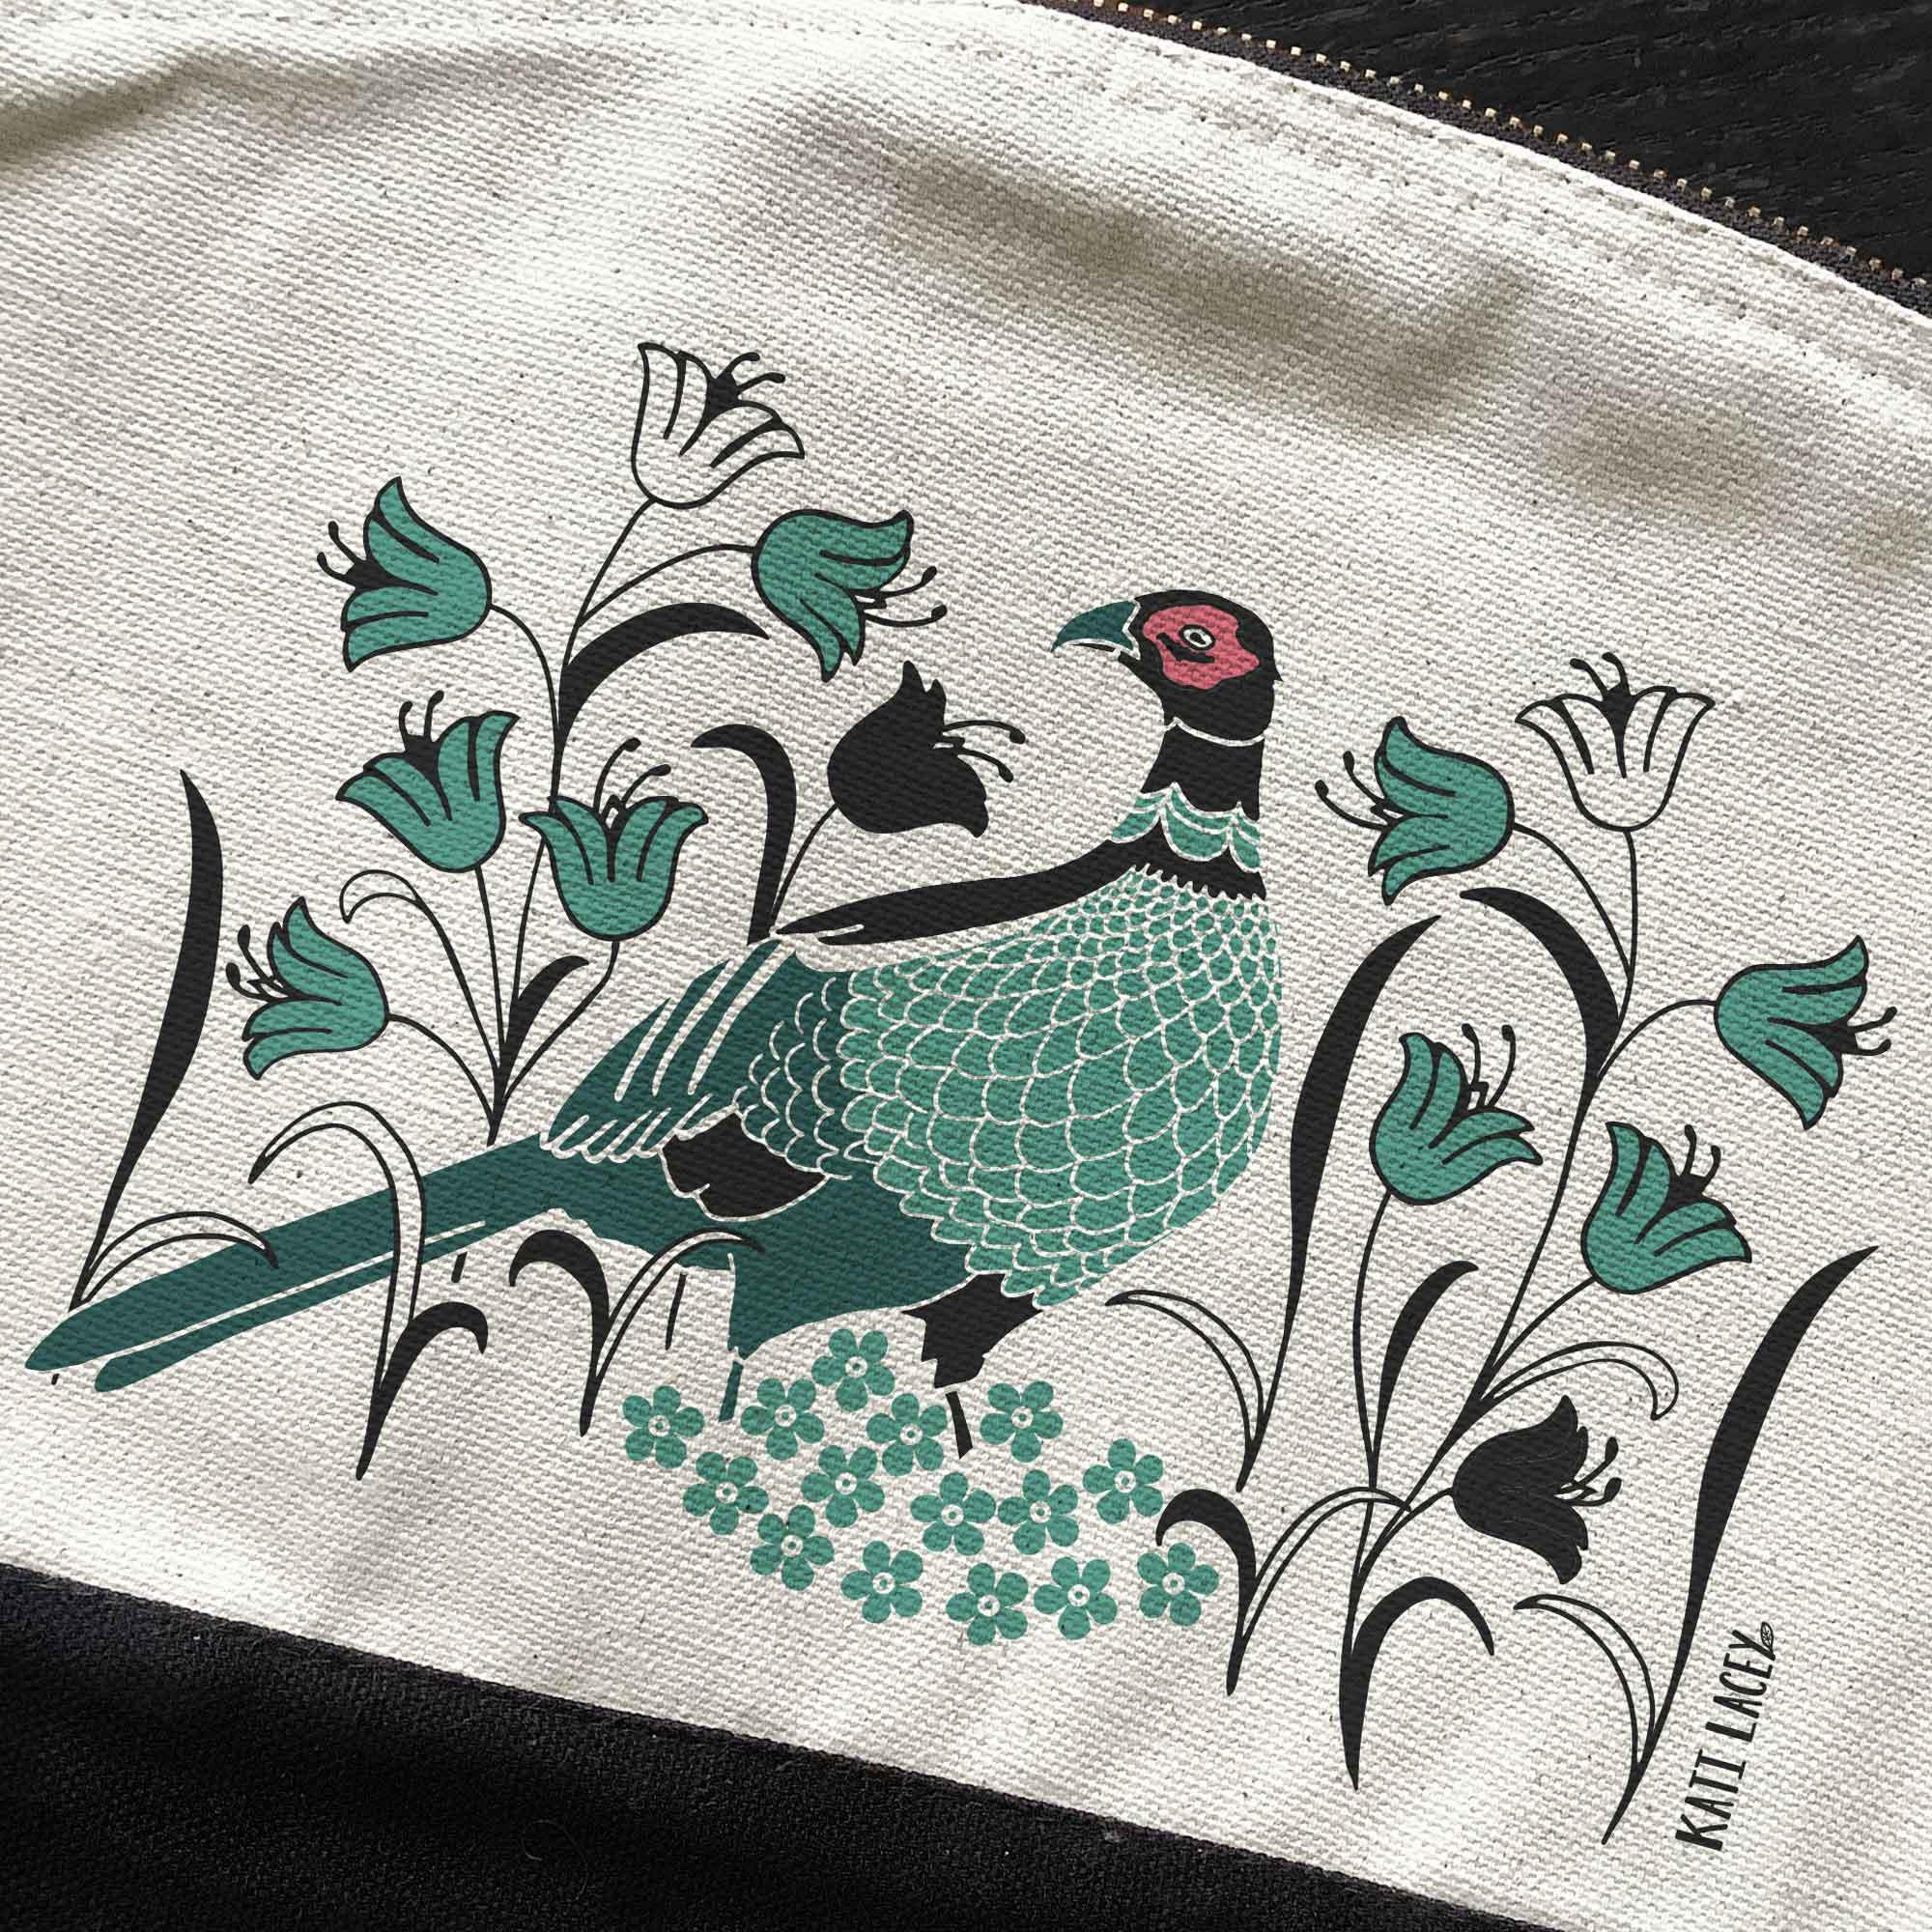 Pheasant on pouch-washbag-toiletry bag-pencil case-make up bag-storage bag for travel-medication bag-luxury